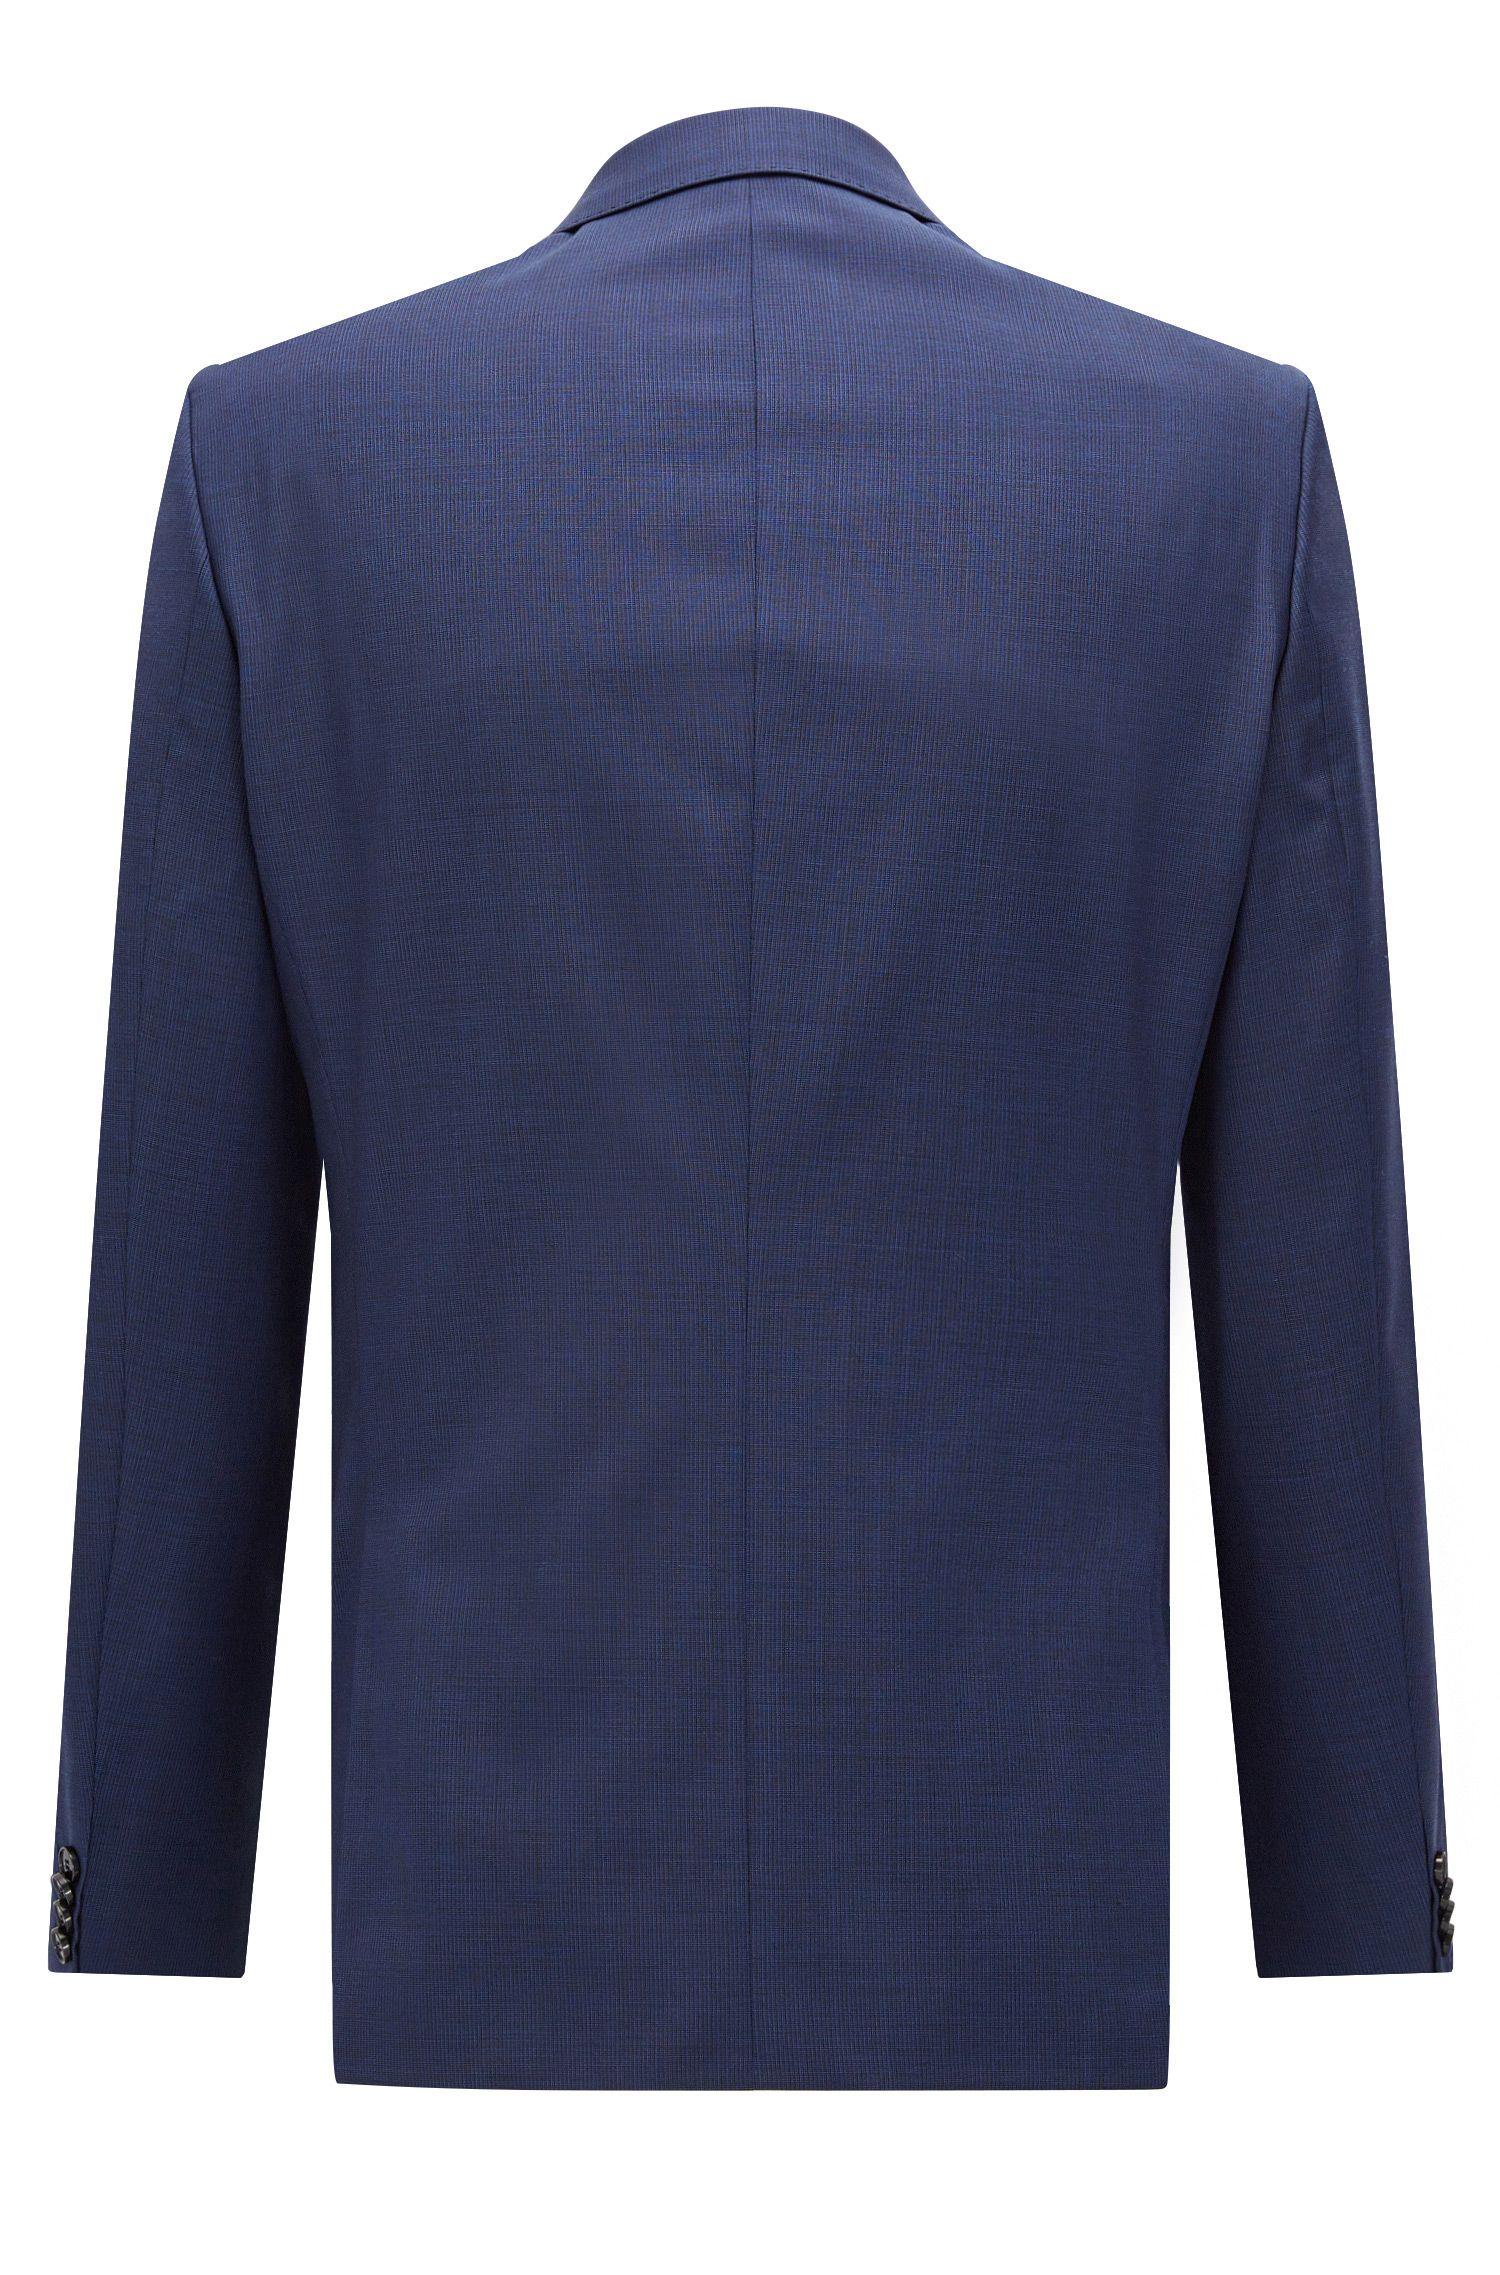 Nailhead Italian Wool Suit, Slim Fit | C-Huge/C-Genius